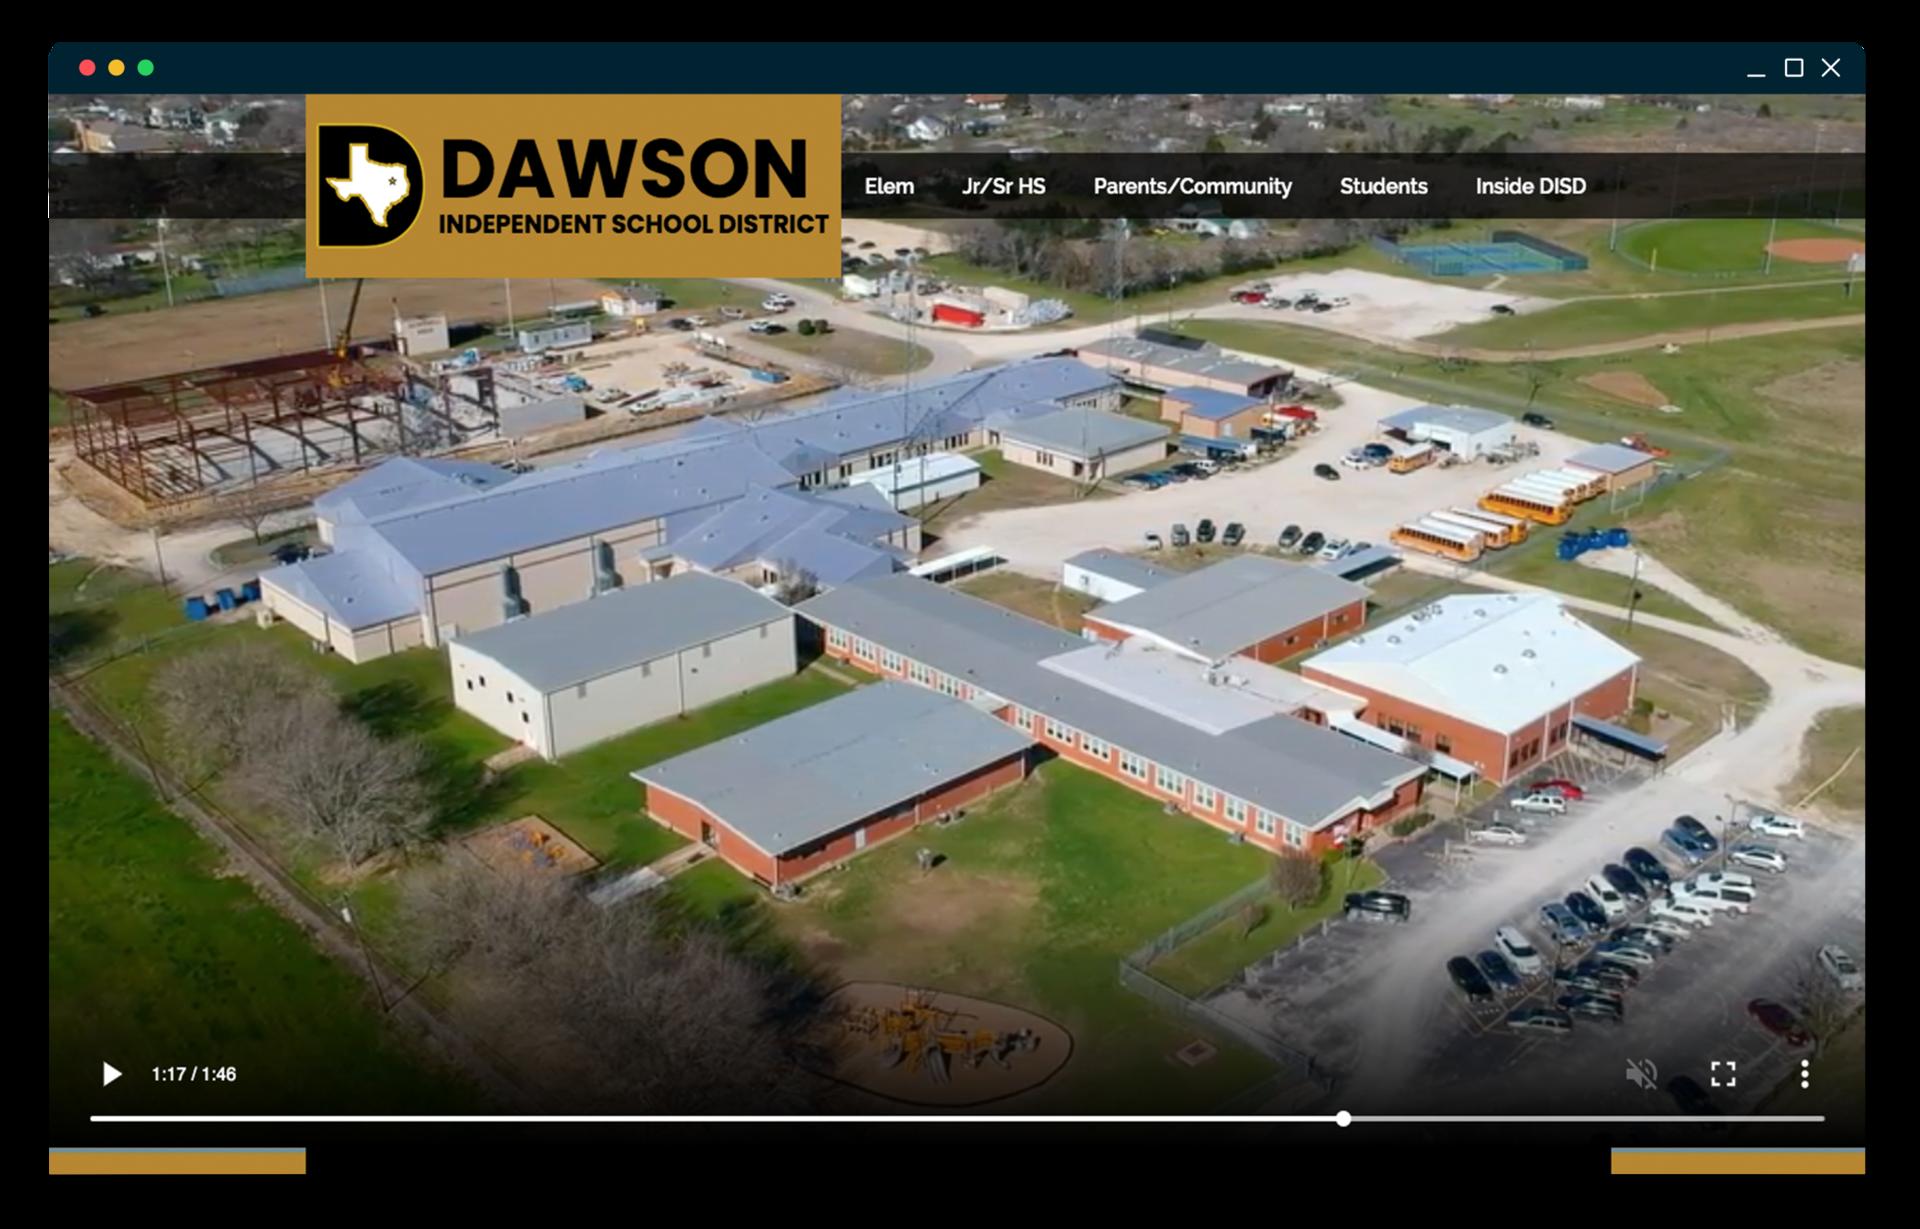 Dawson ISD website homepage screenshot